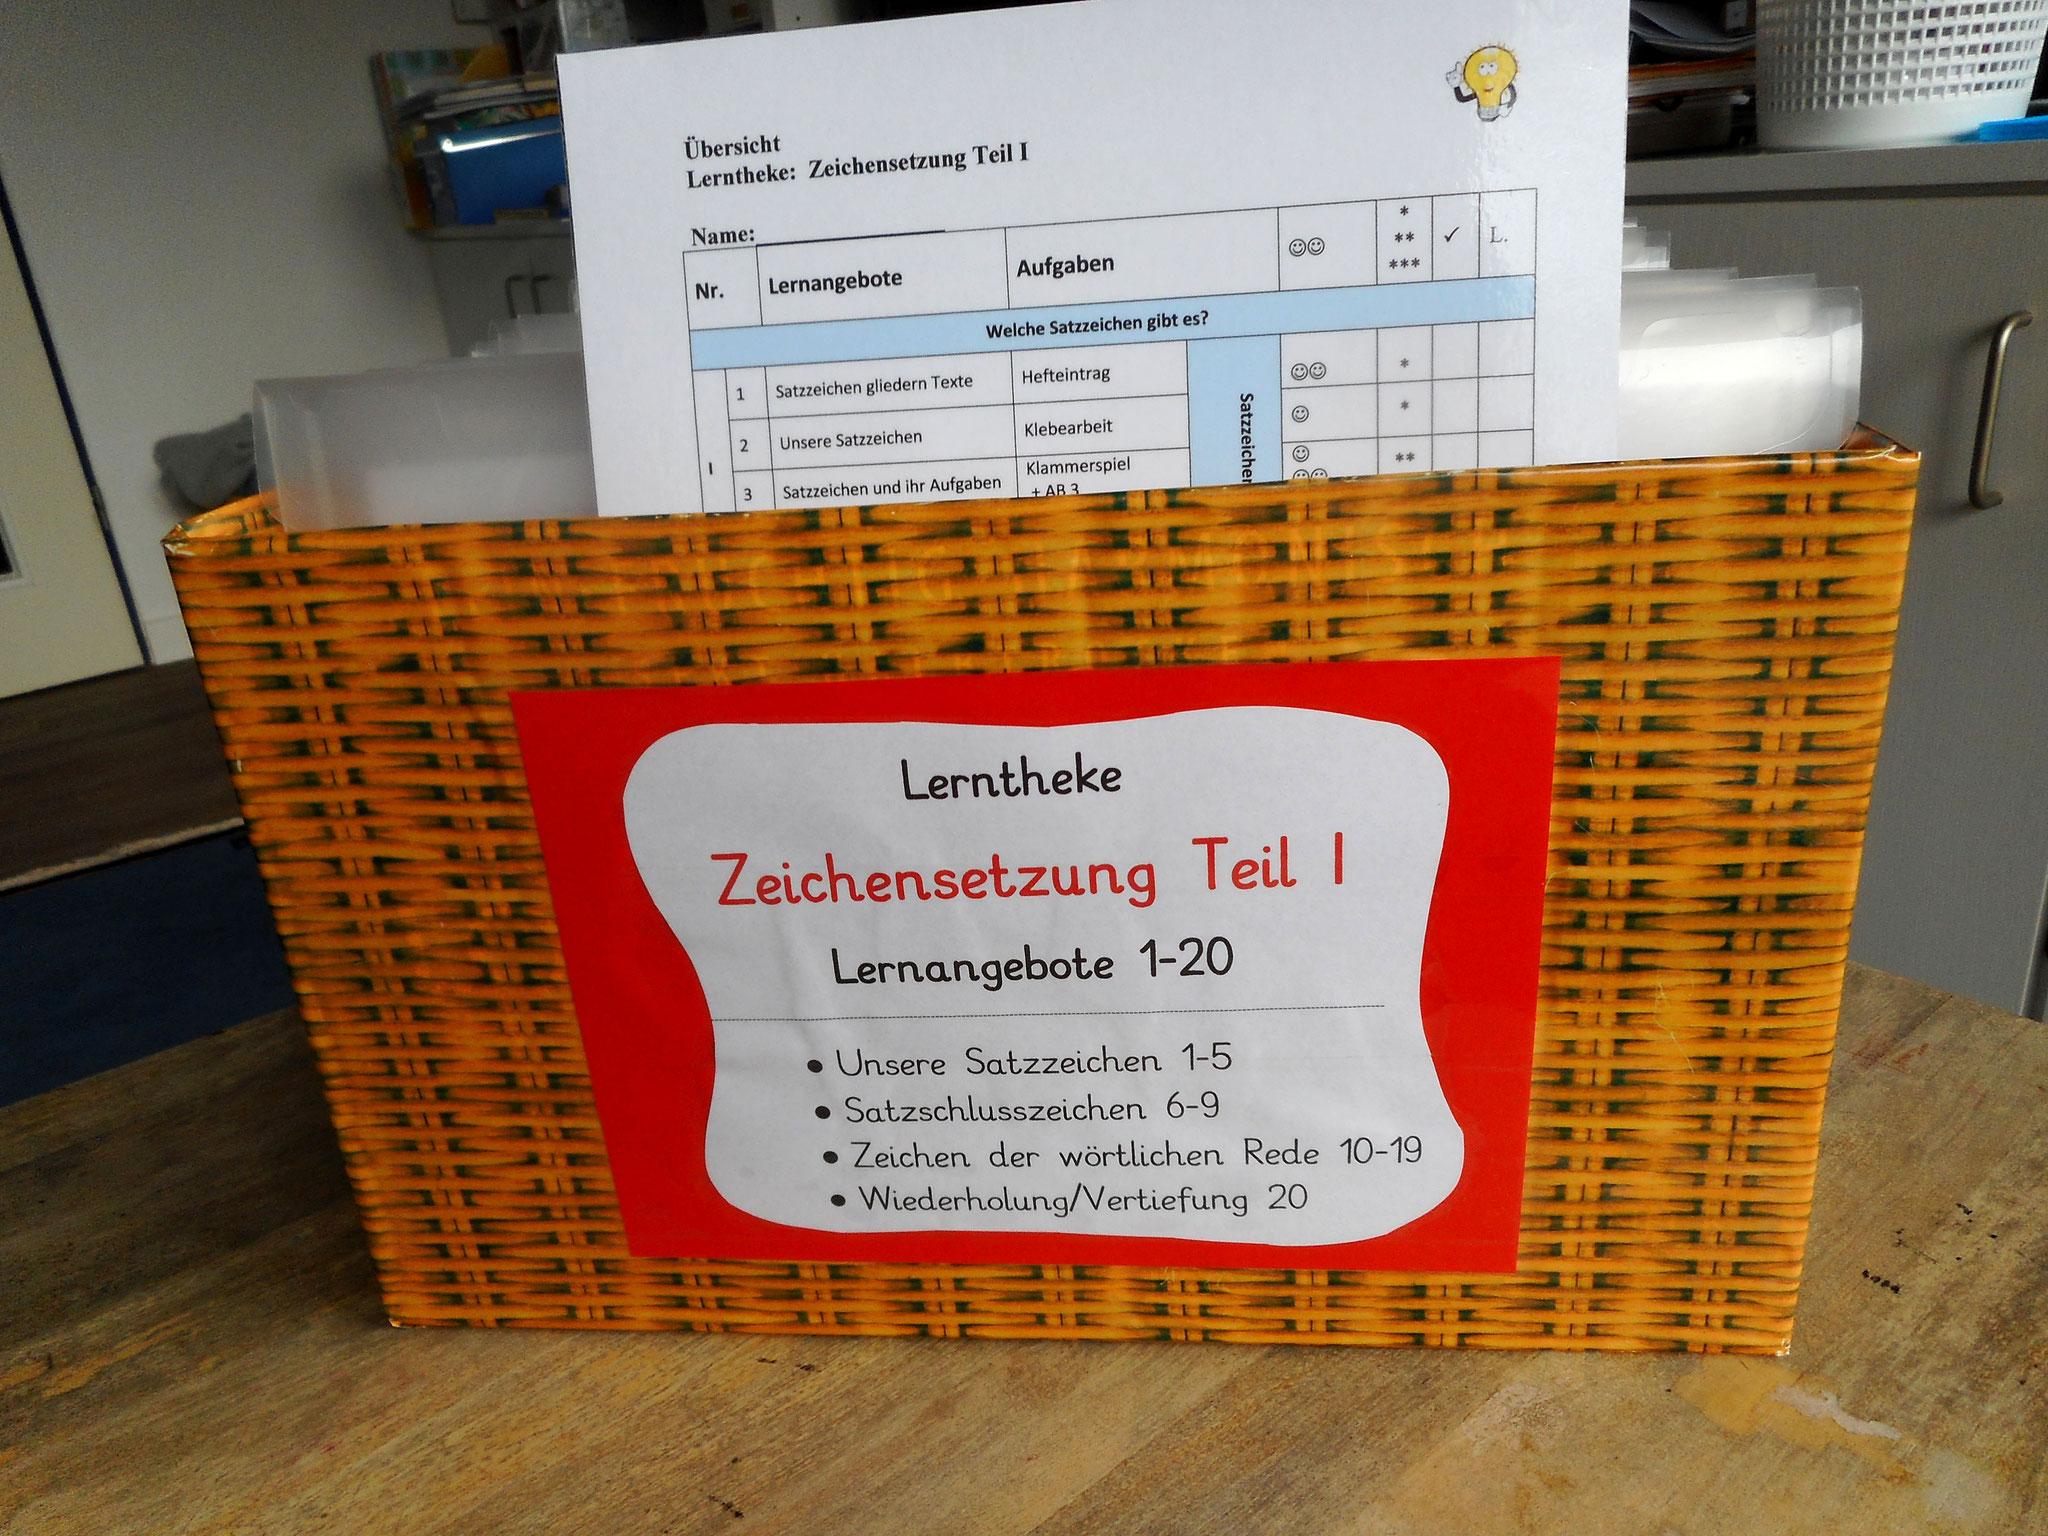 Lernangebote in fertig erstellter Kiste mit 20 Lernangeboten